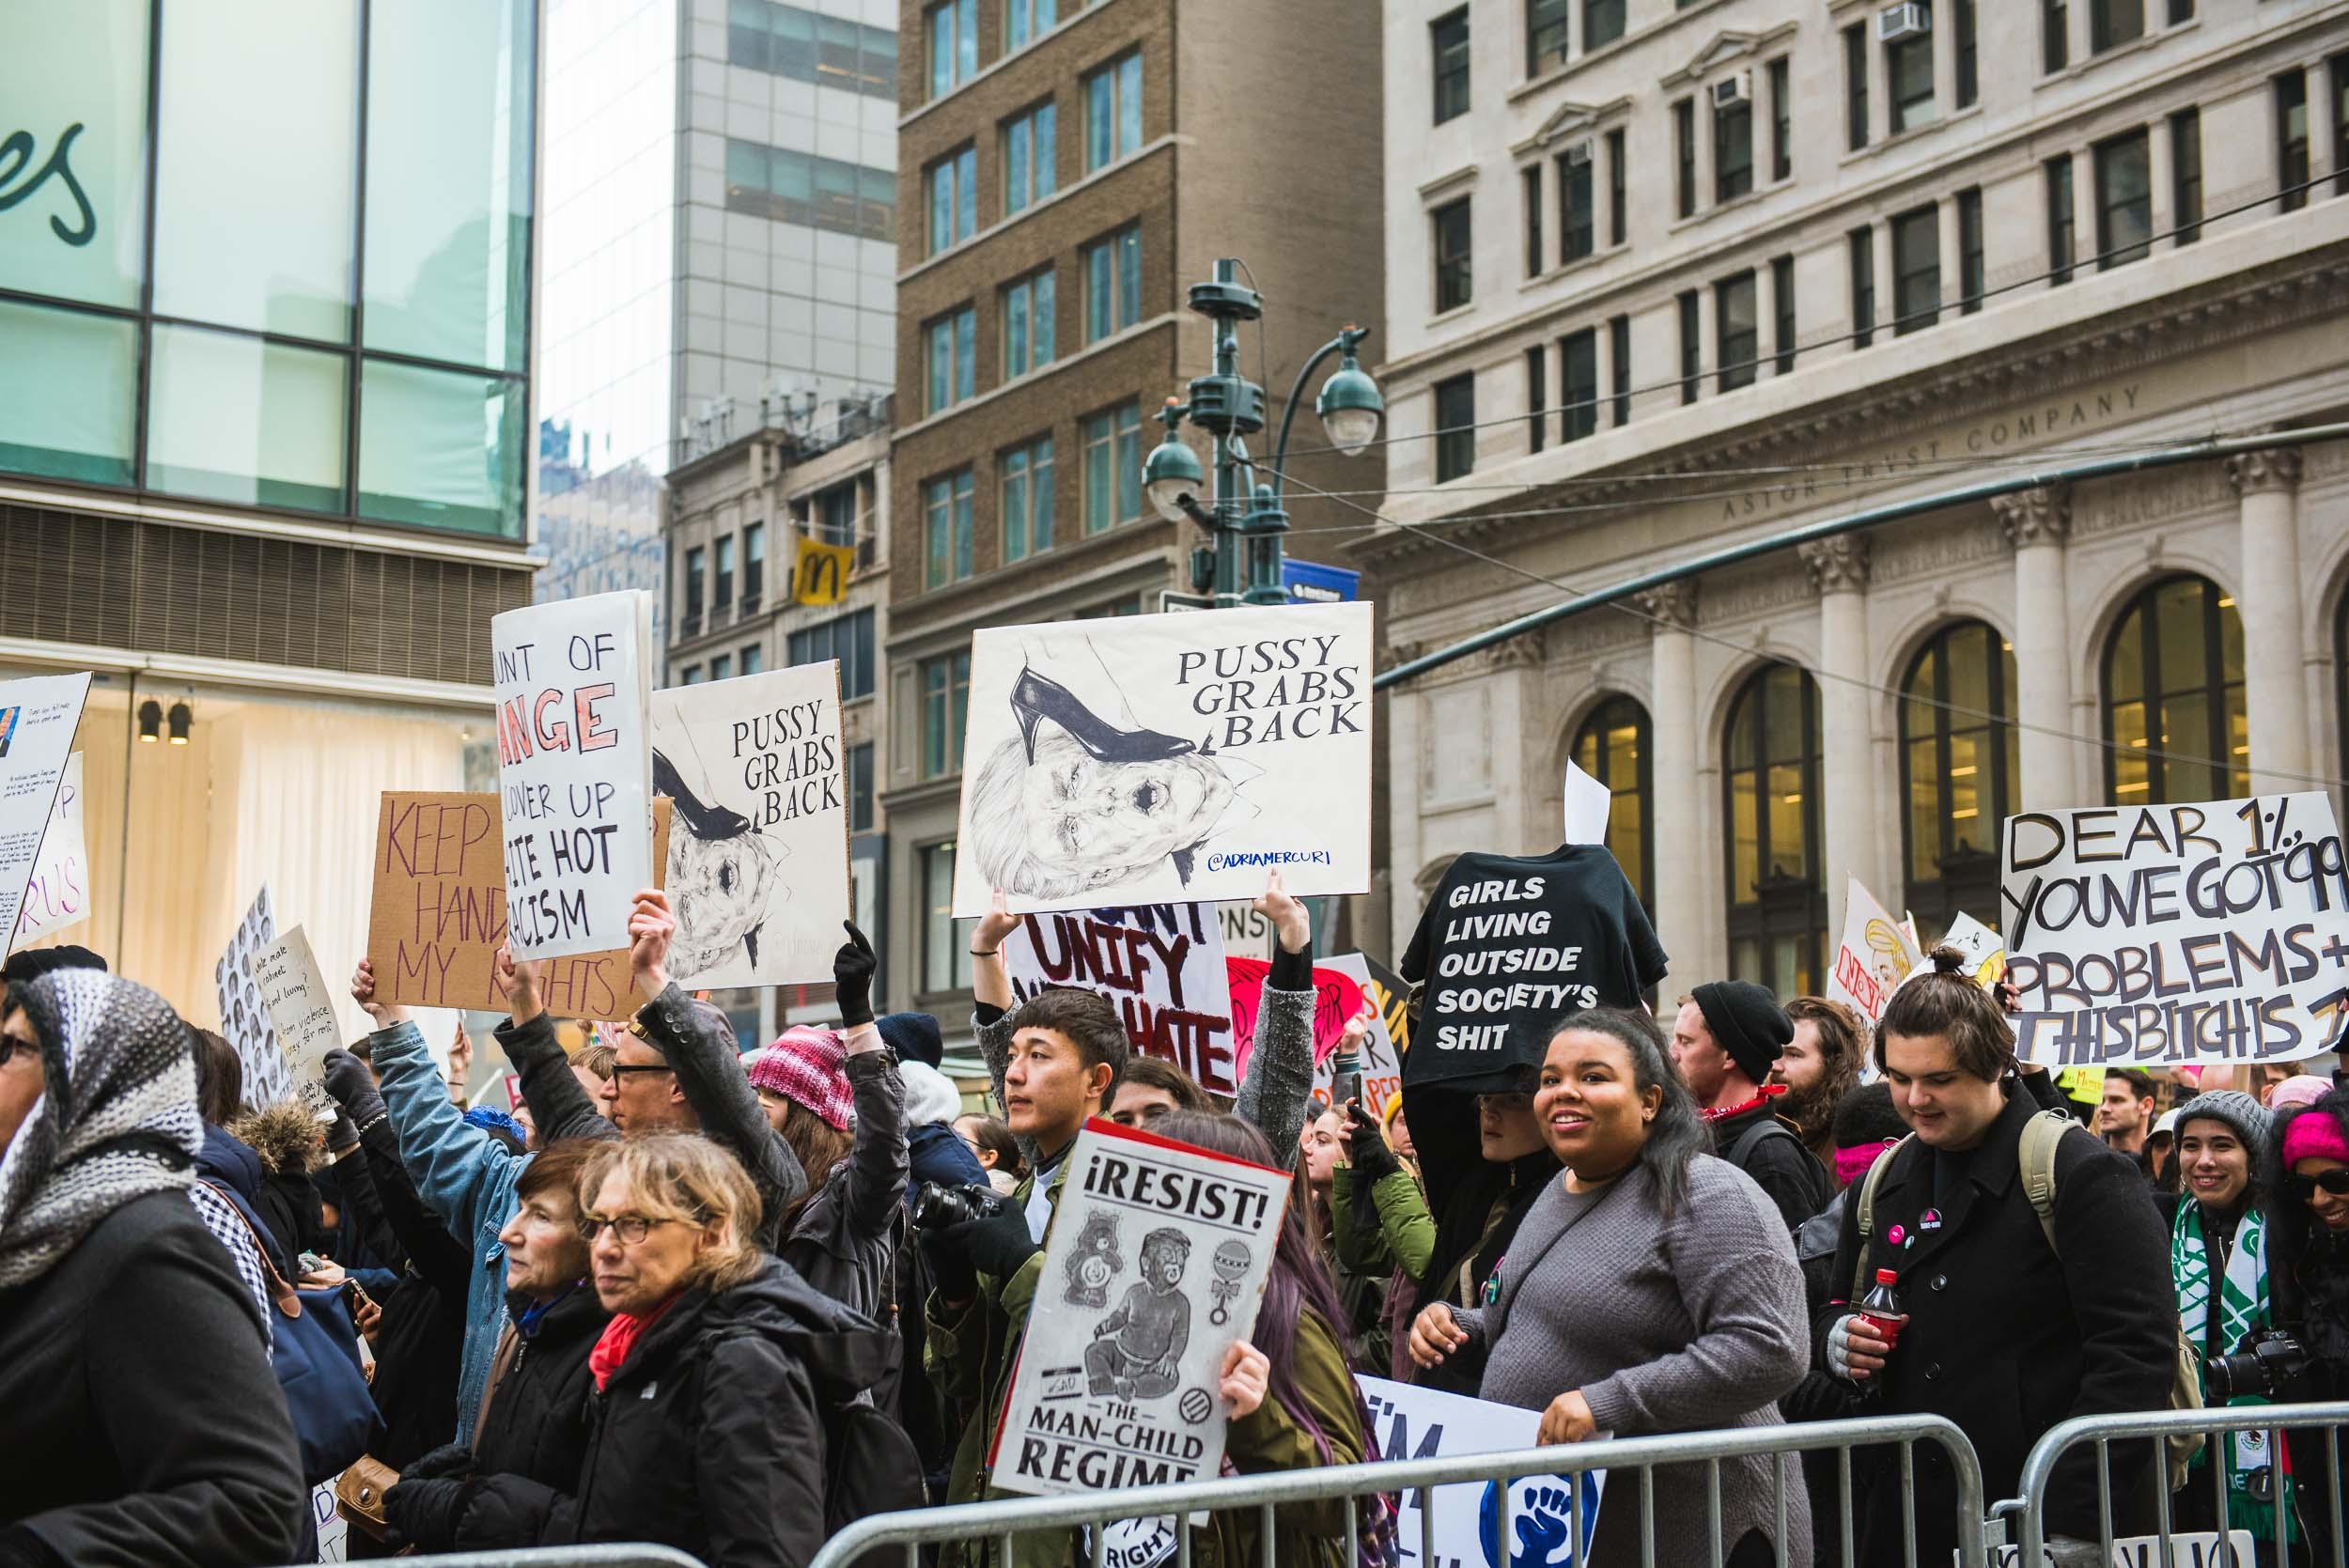 20170121 - NYC Women's March-11.jpg